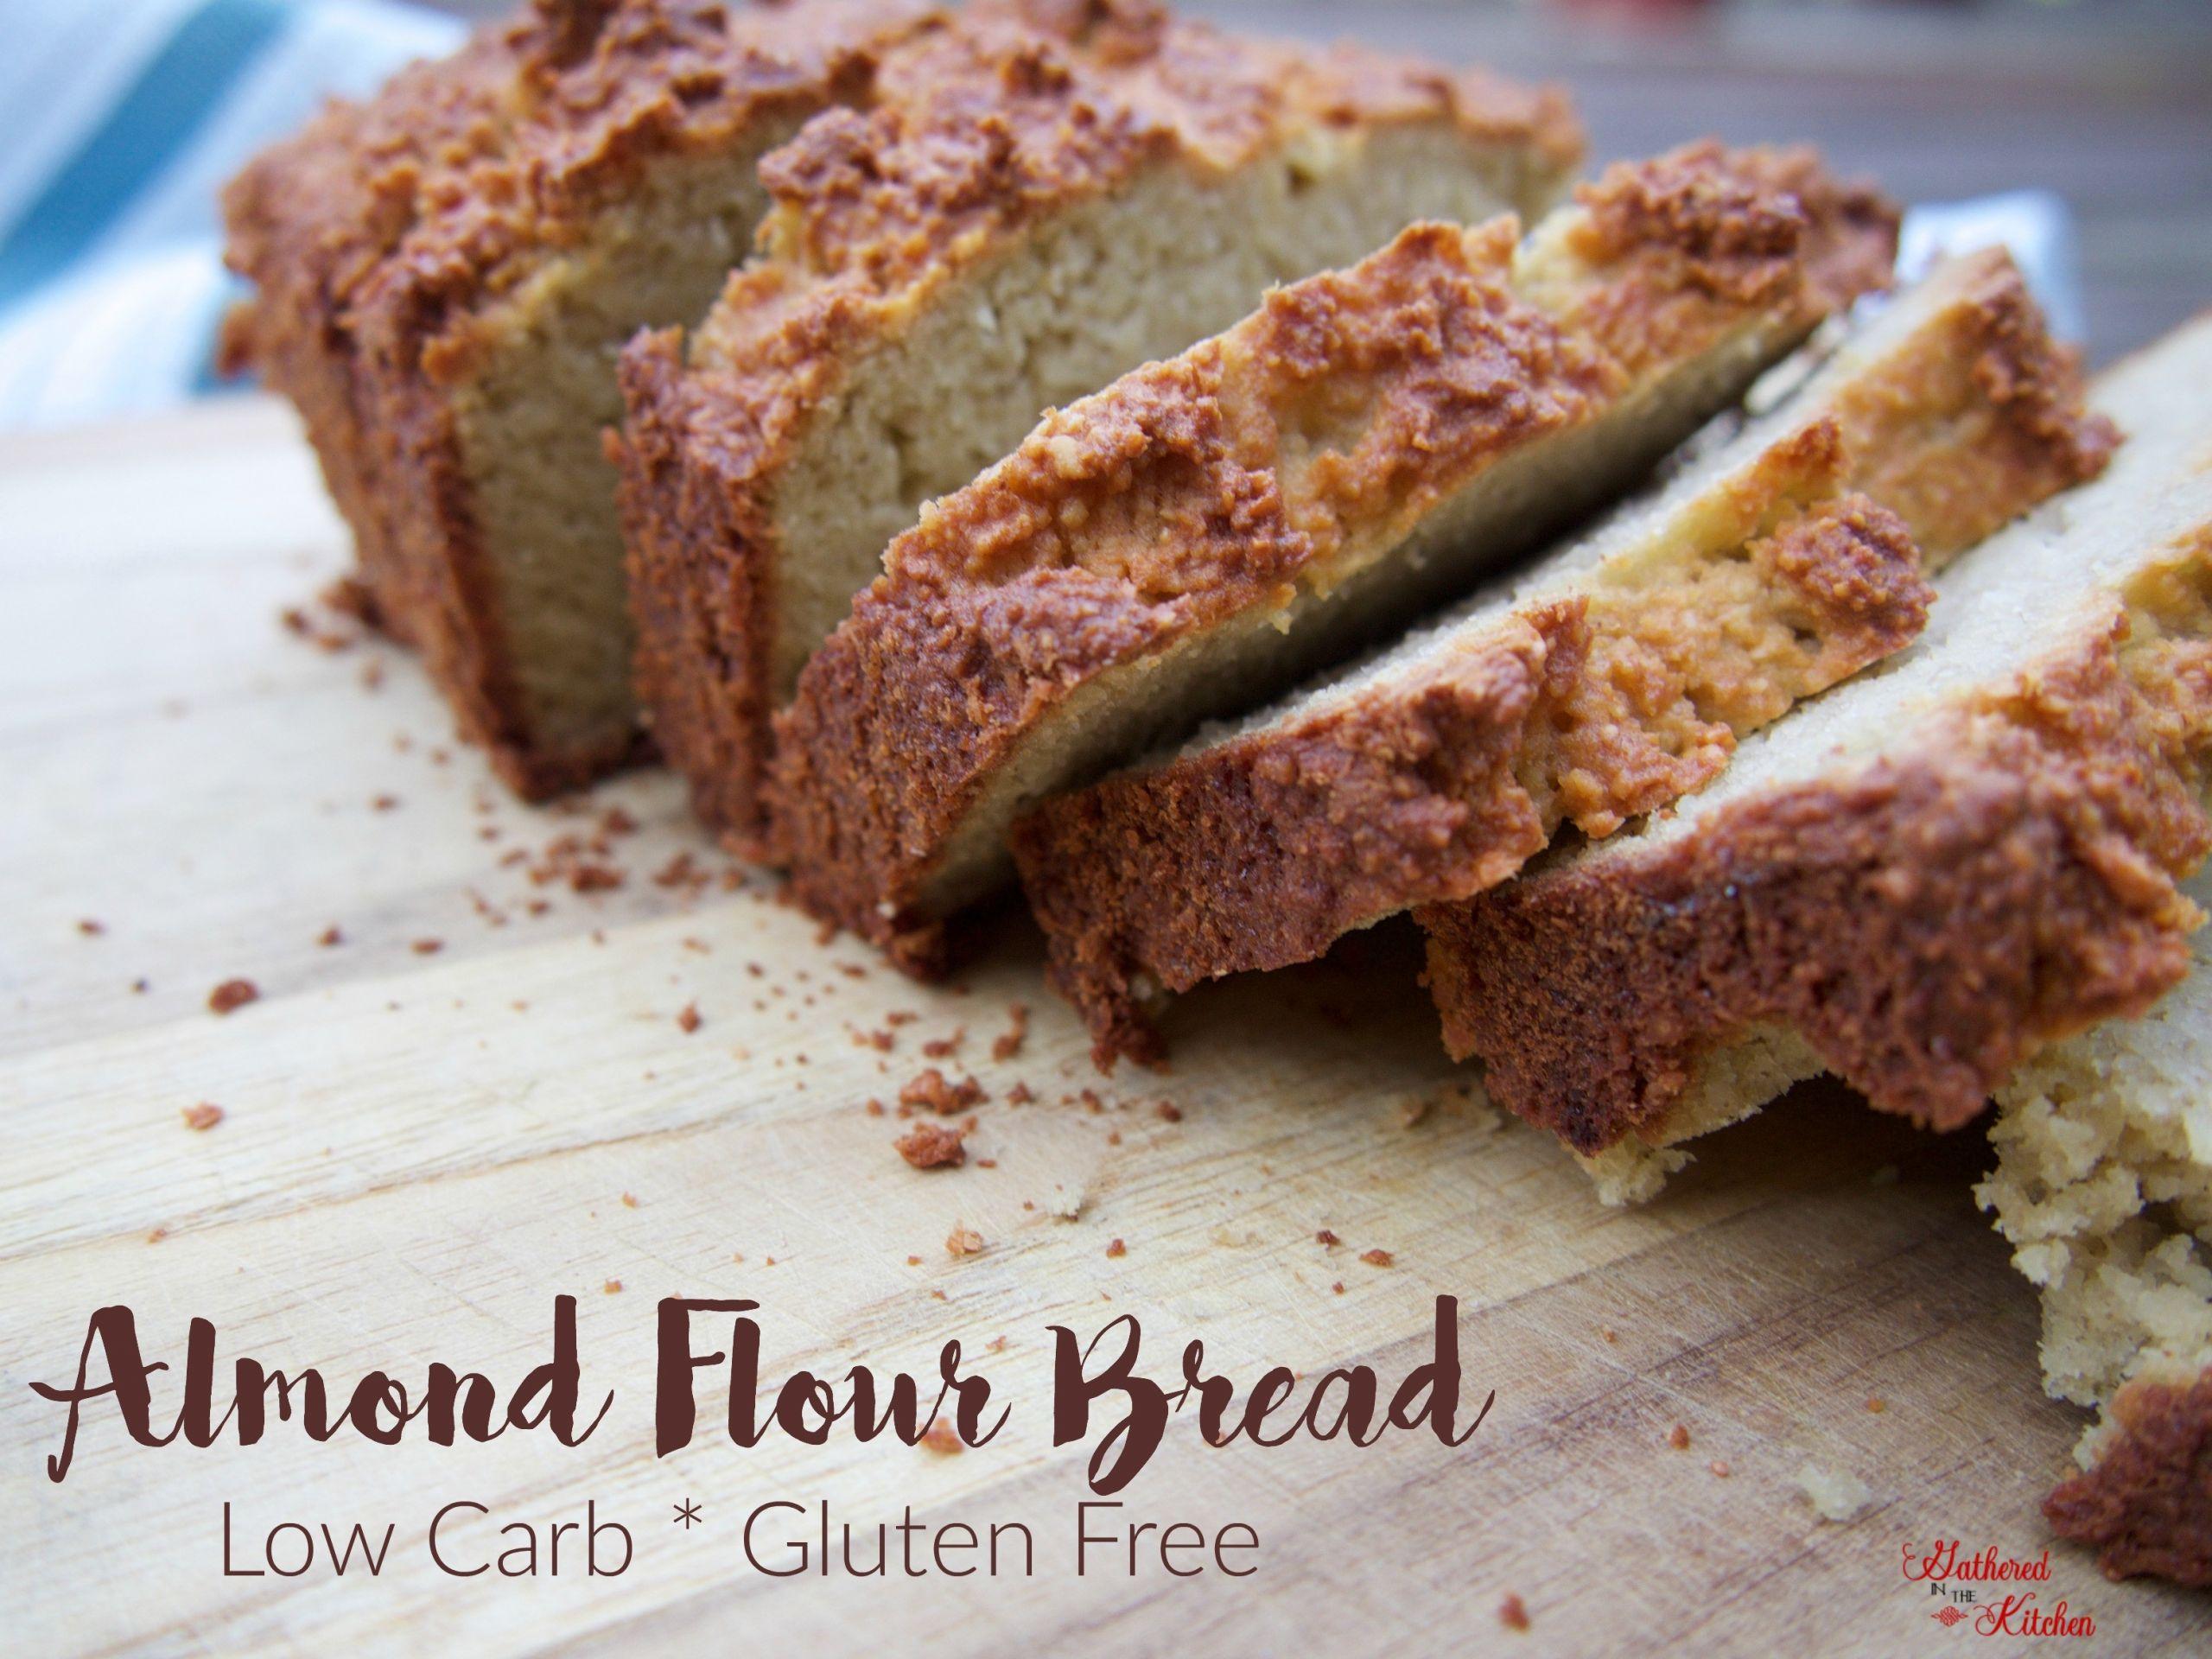 Gluten Free Bread Flour Recipe  Almond Flour Bread Low Carb & Gluten Free Gathered In